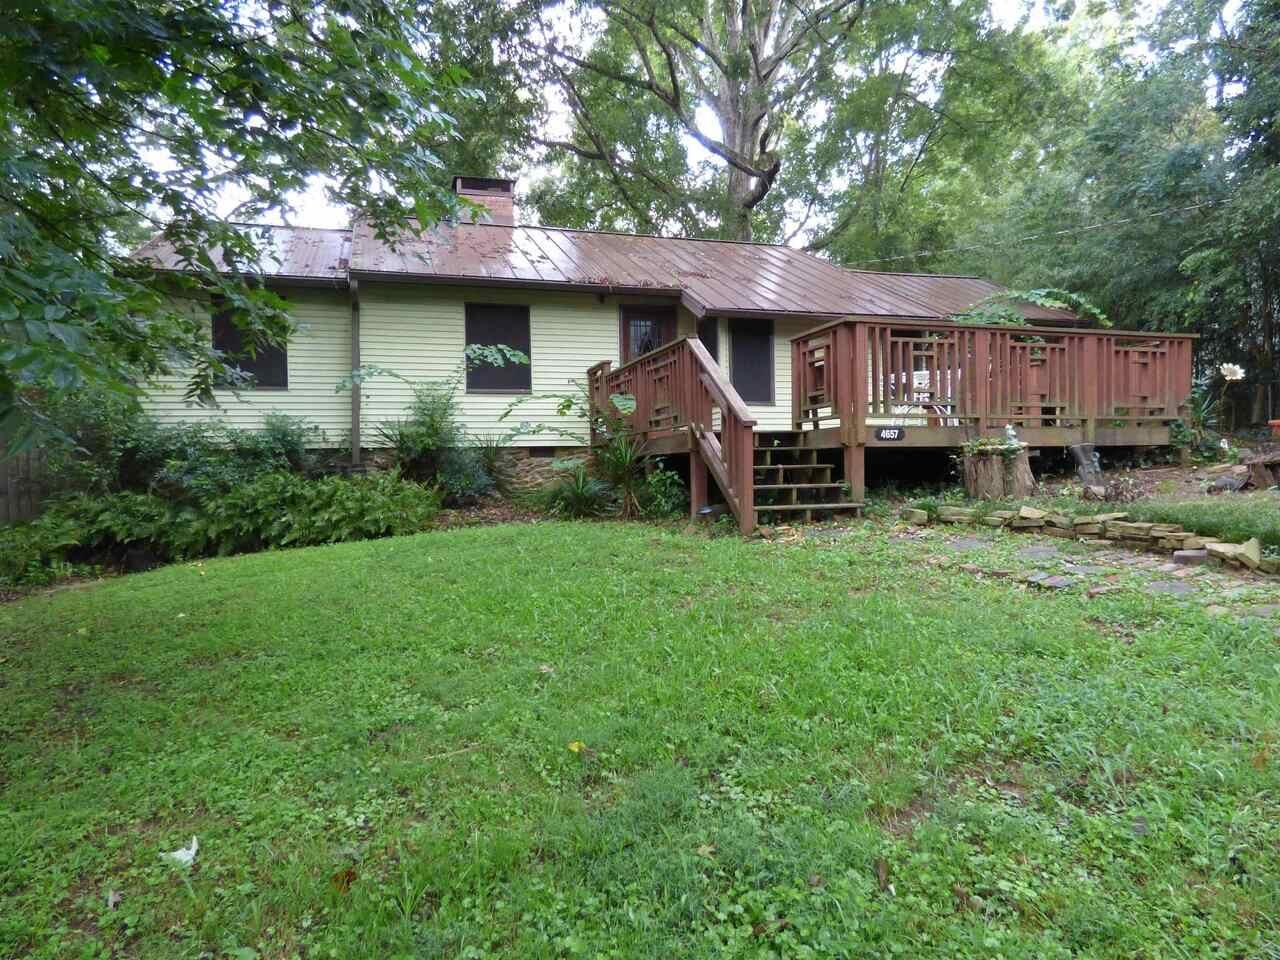 4657 Orchid Drive, Pine Lake, GA 30072 - #: 9042698